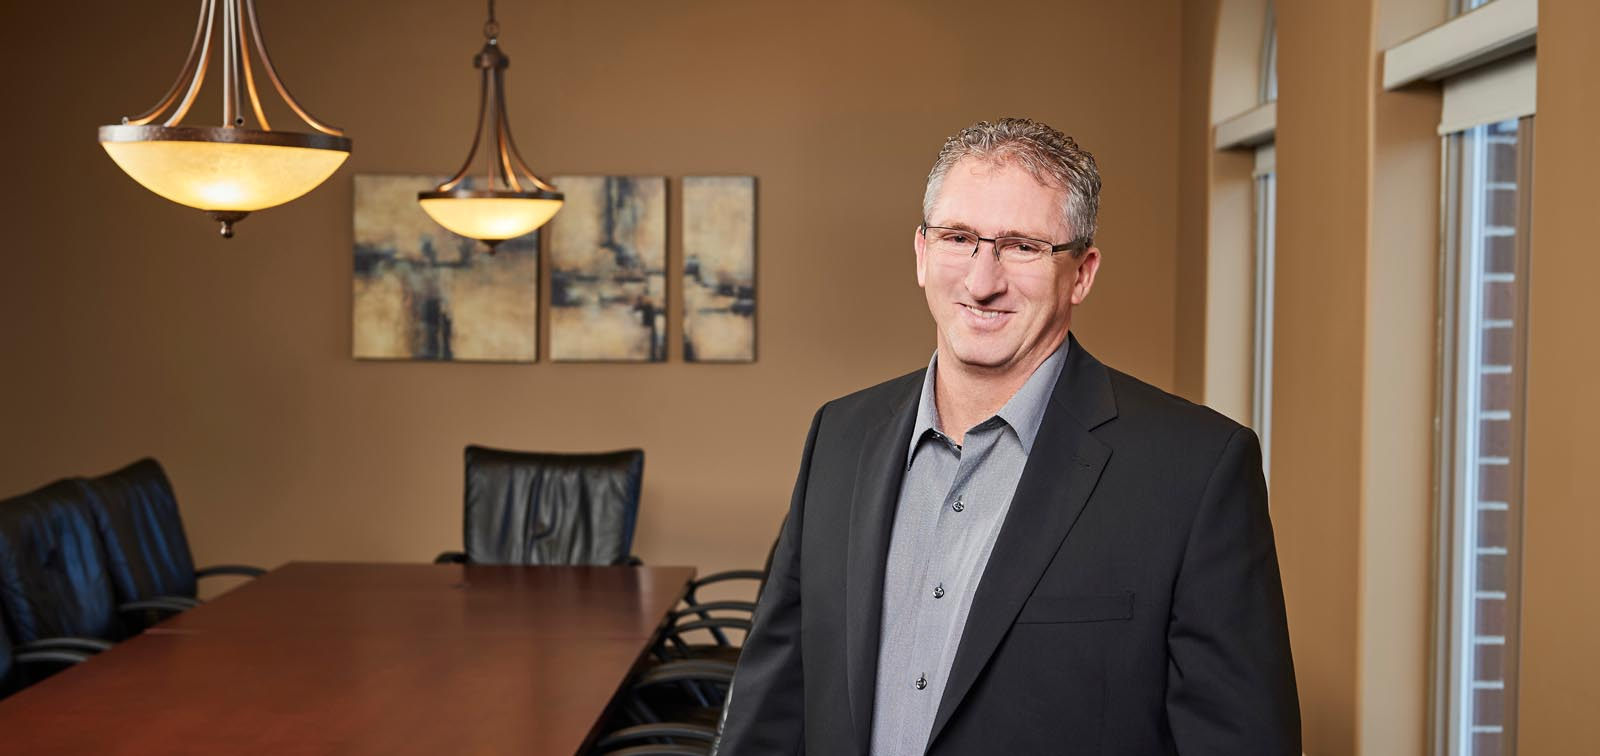 Rob_Hooten_Millards Chartered Professional Accountants